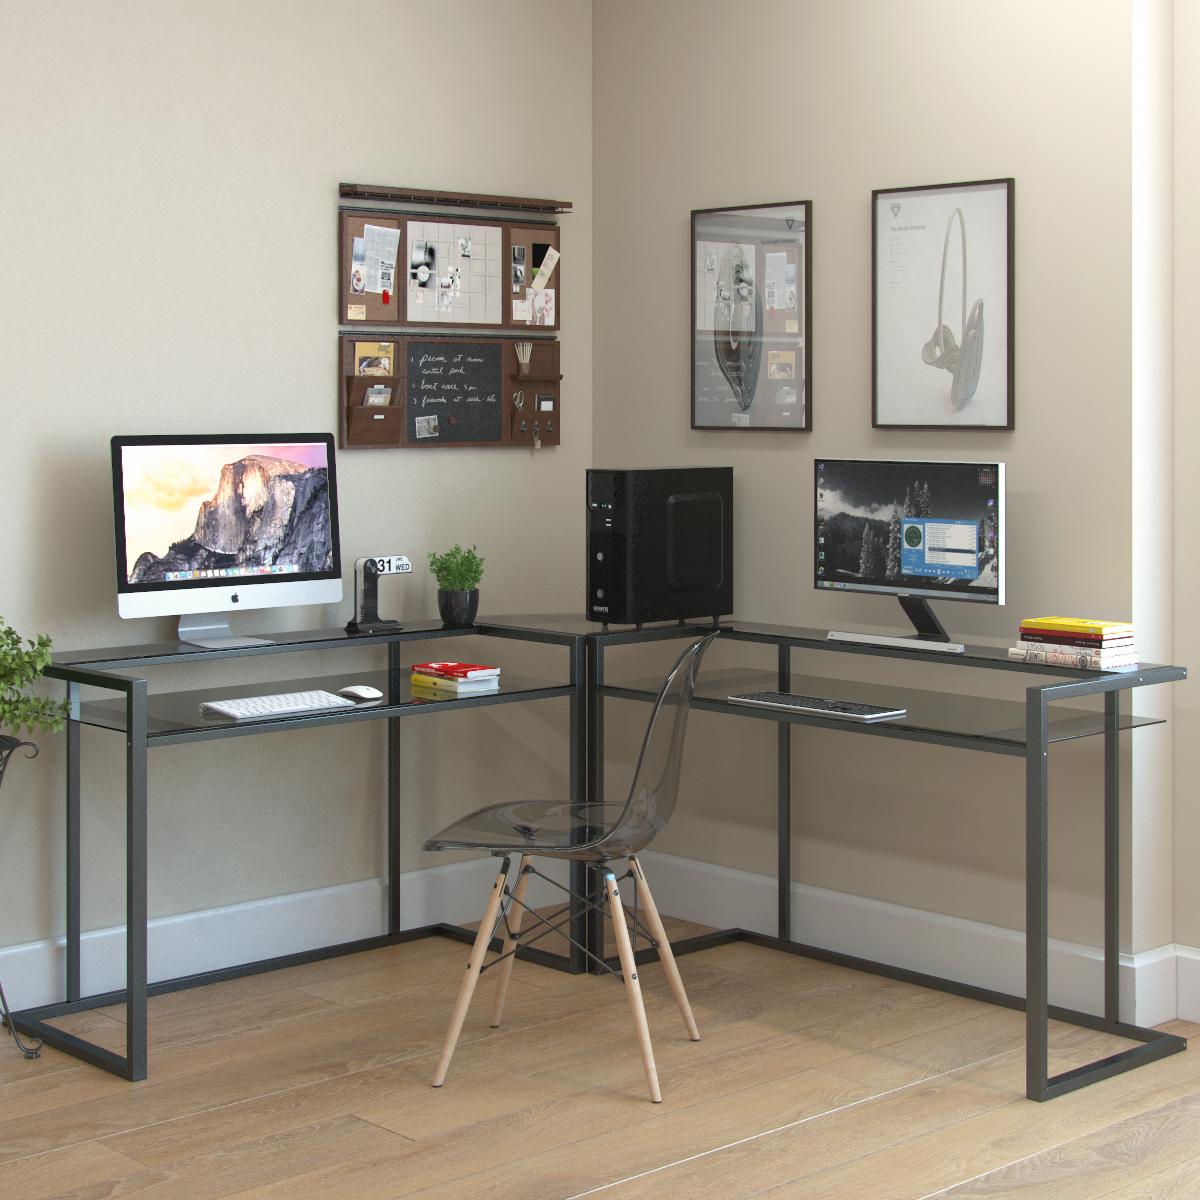 Ryan Rove Belmac 3 Piece Corner C Frame L Shaped Computer Desk